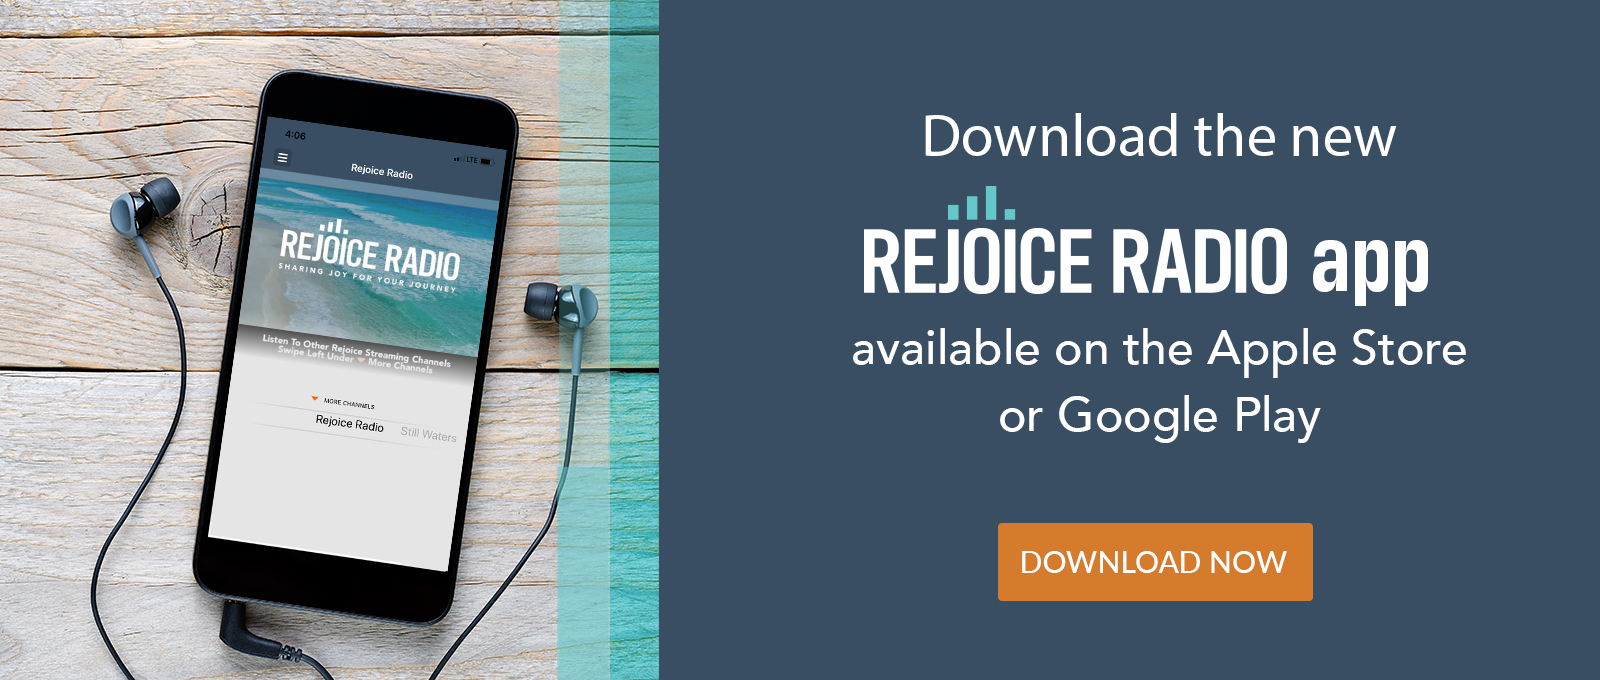 Rejoice Radio App